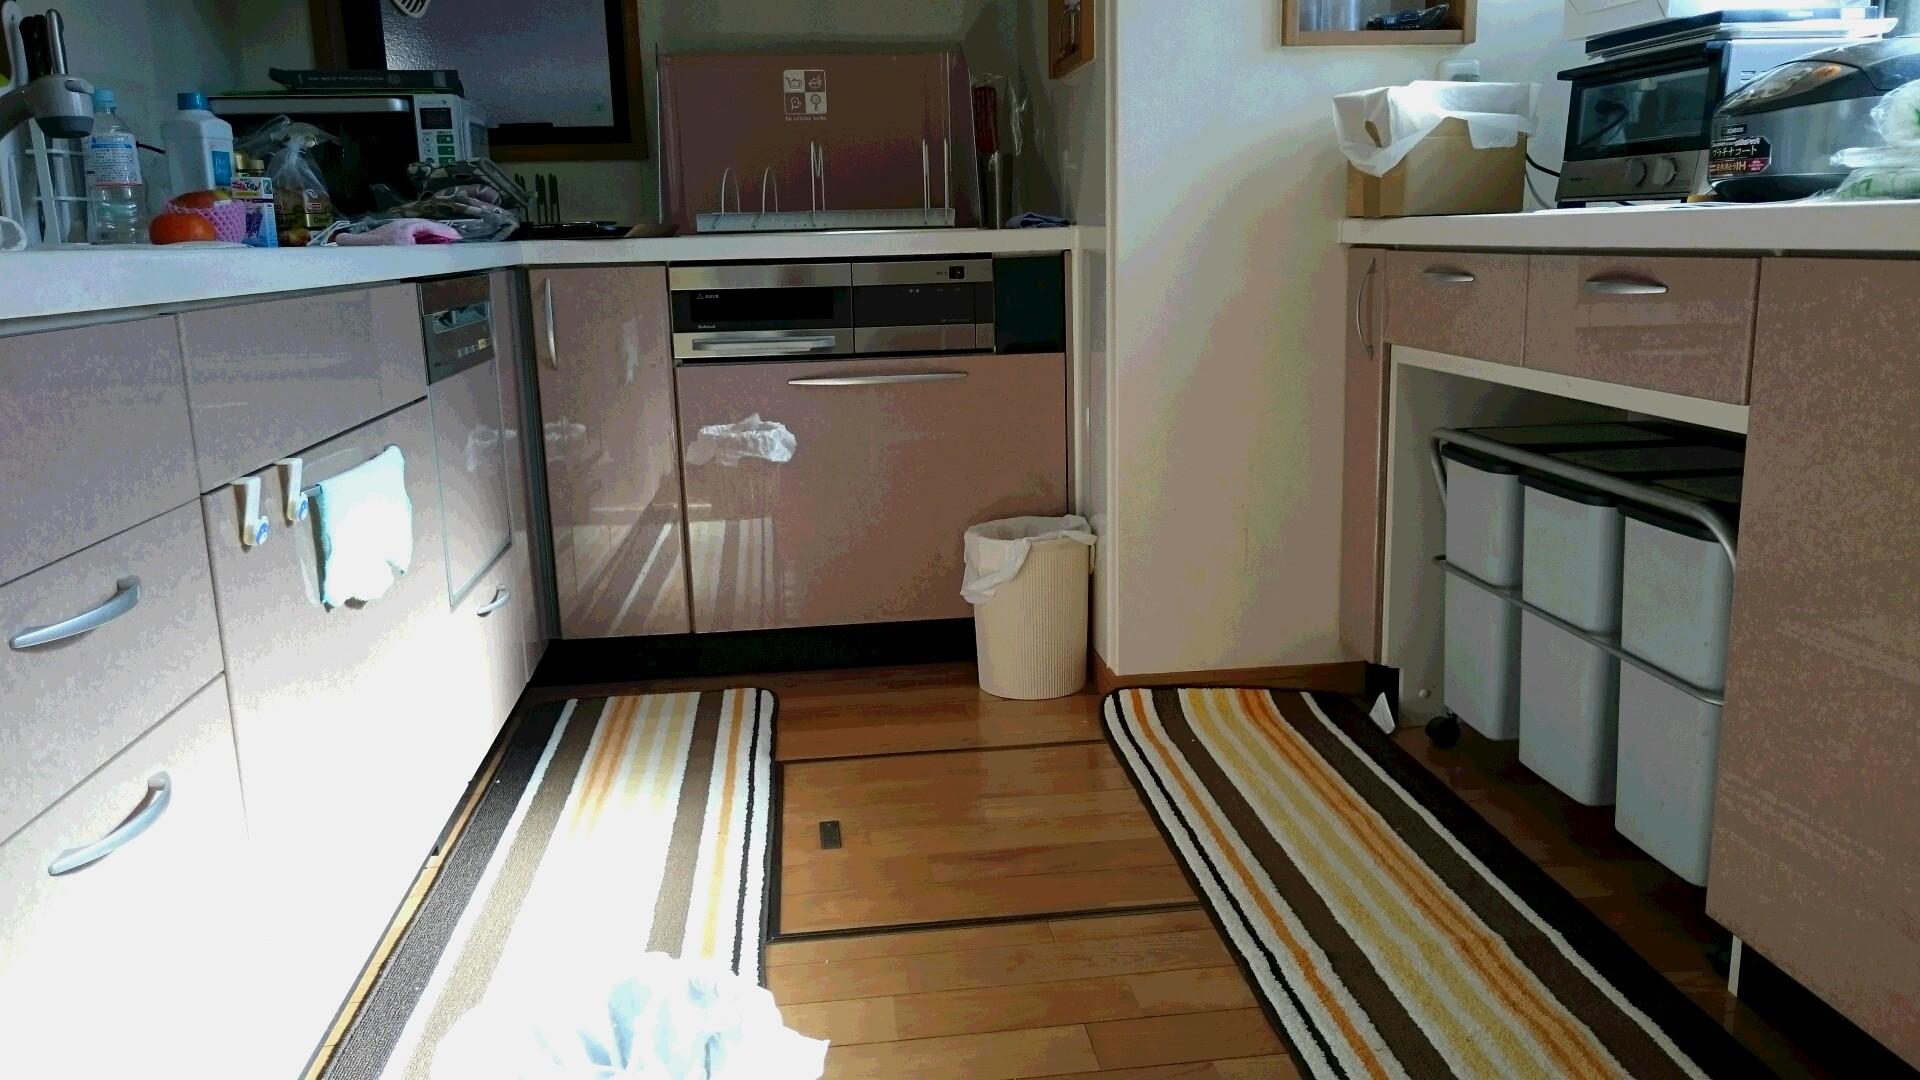 Office・Kitchen'sのキッチン・ミニリフォーム工事_a0155290_17543813.jpg